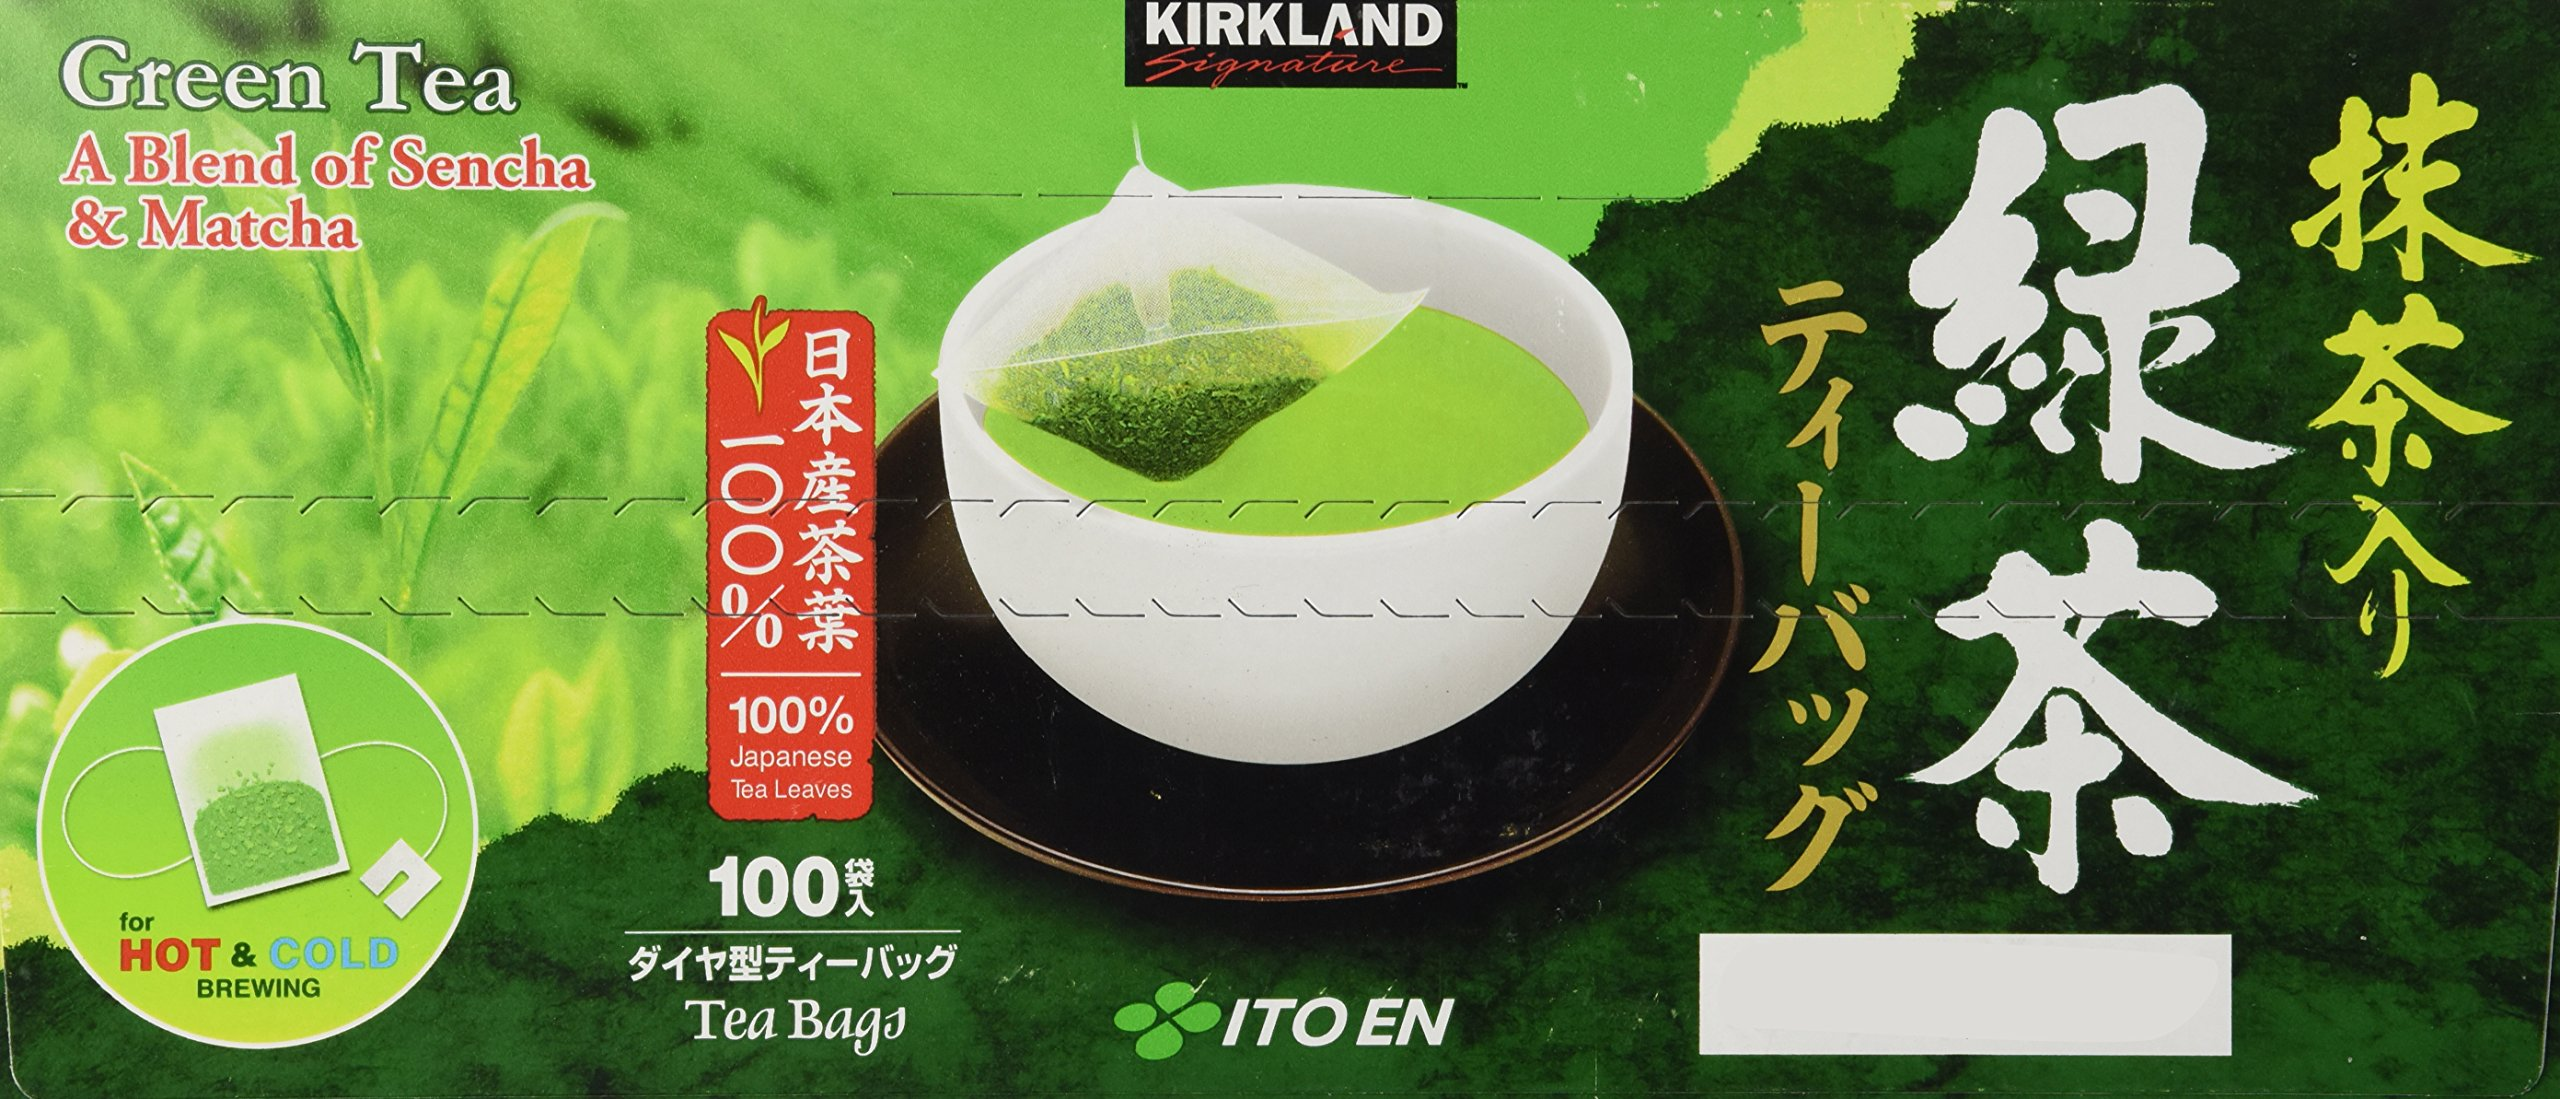 Kirkland Signature Ito En Matcha Blend (Green Tea), 100% Japanese Green Tea Leaves, 100 Tea Bags by Kirkland Signature